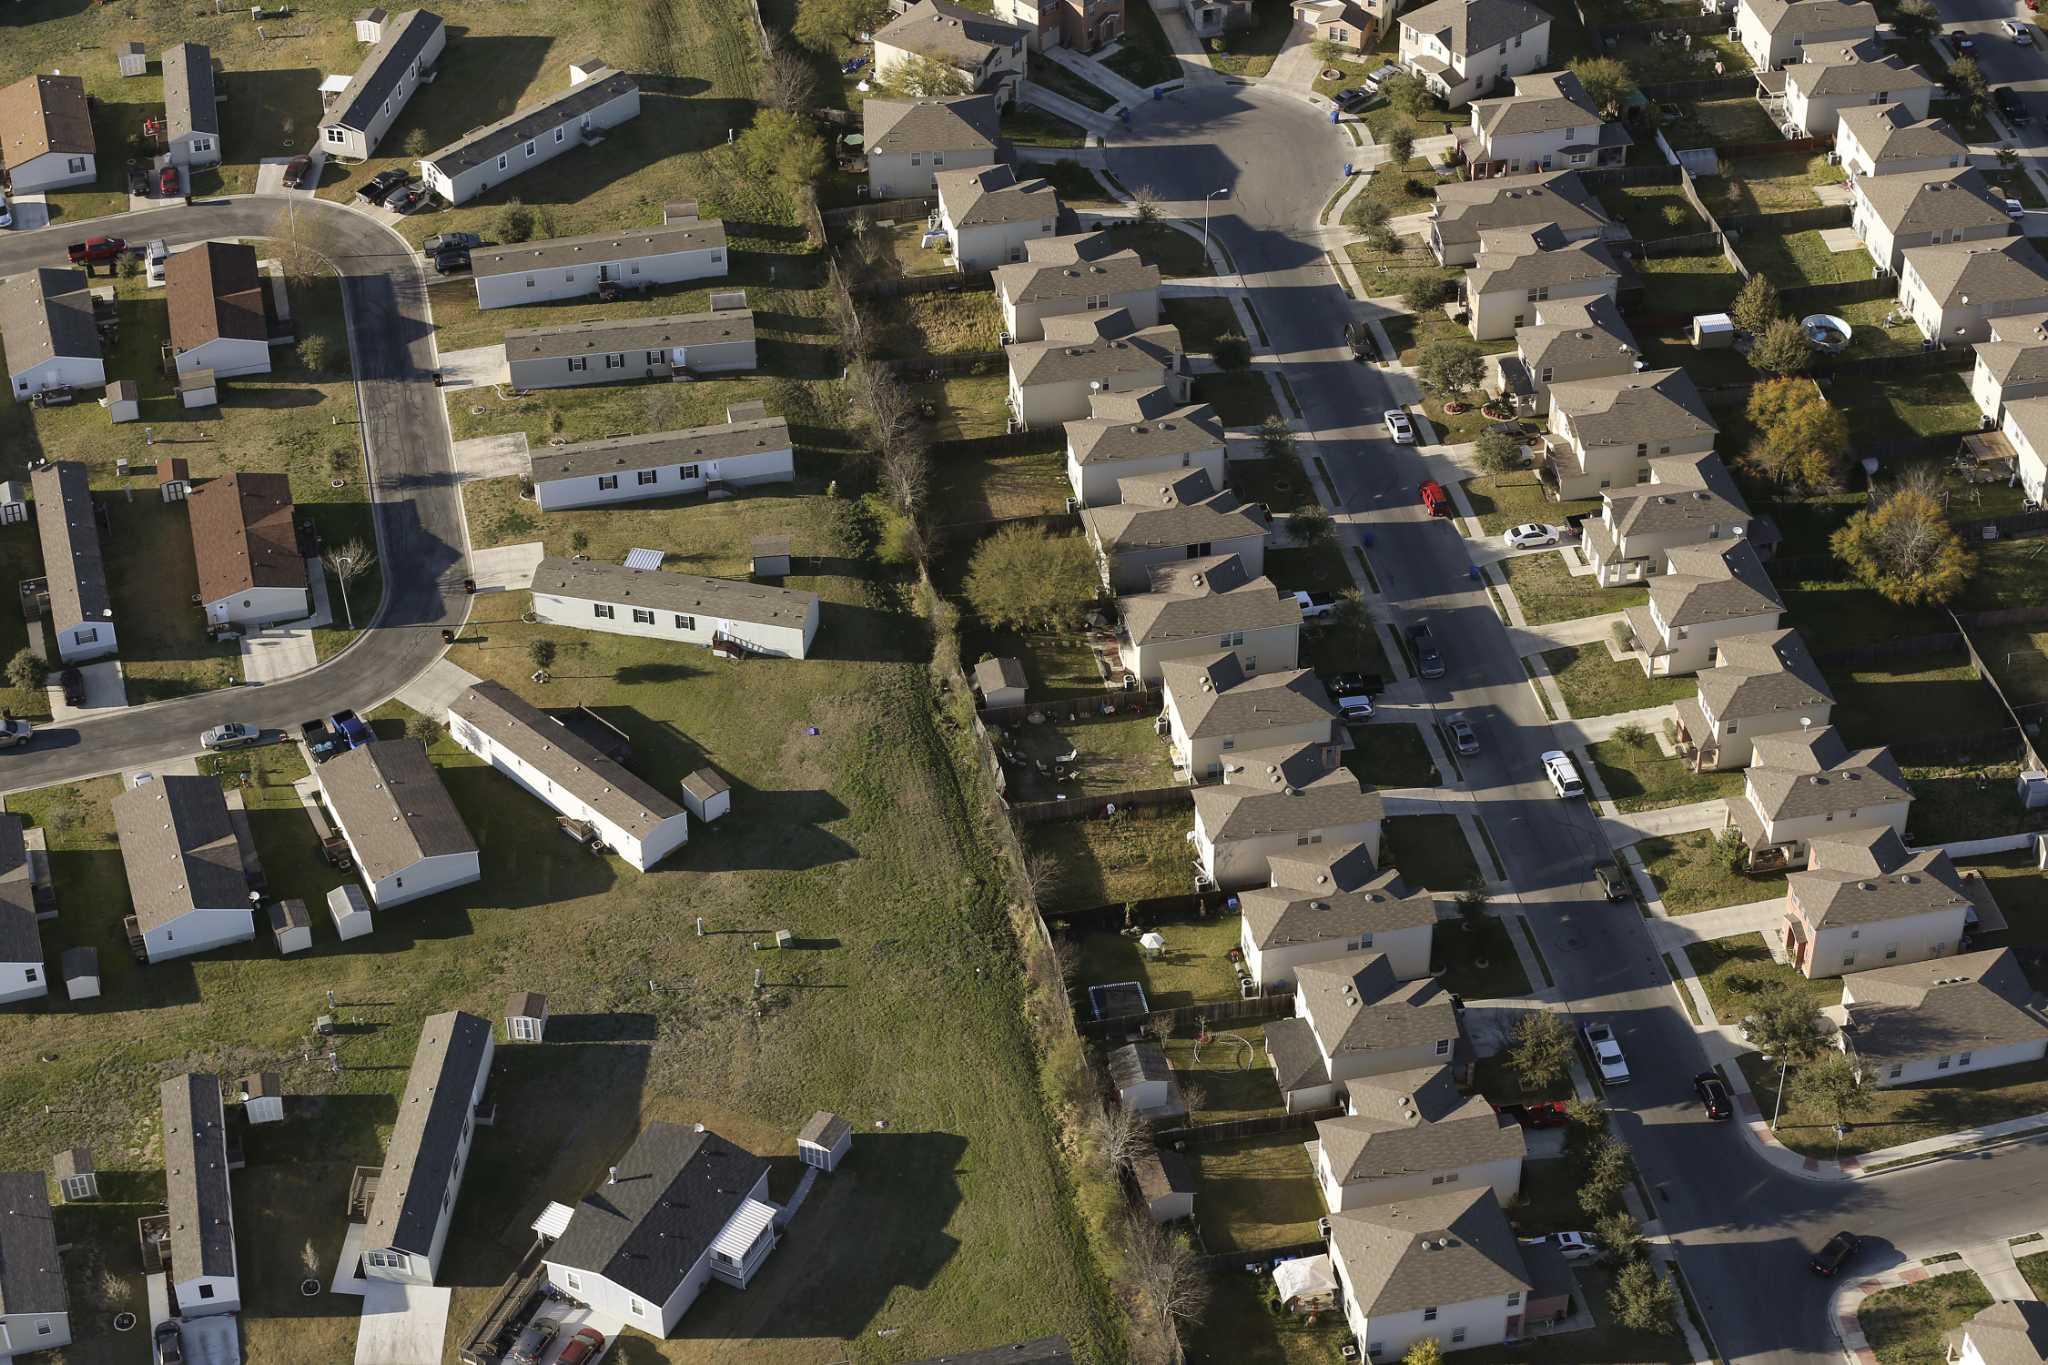 san antonio housing market sets new sales price records for 2016 san antonio express news